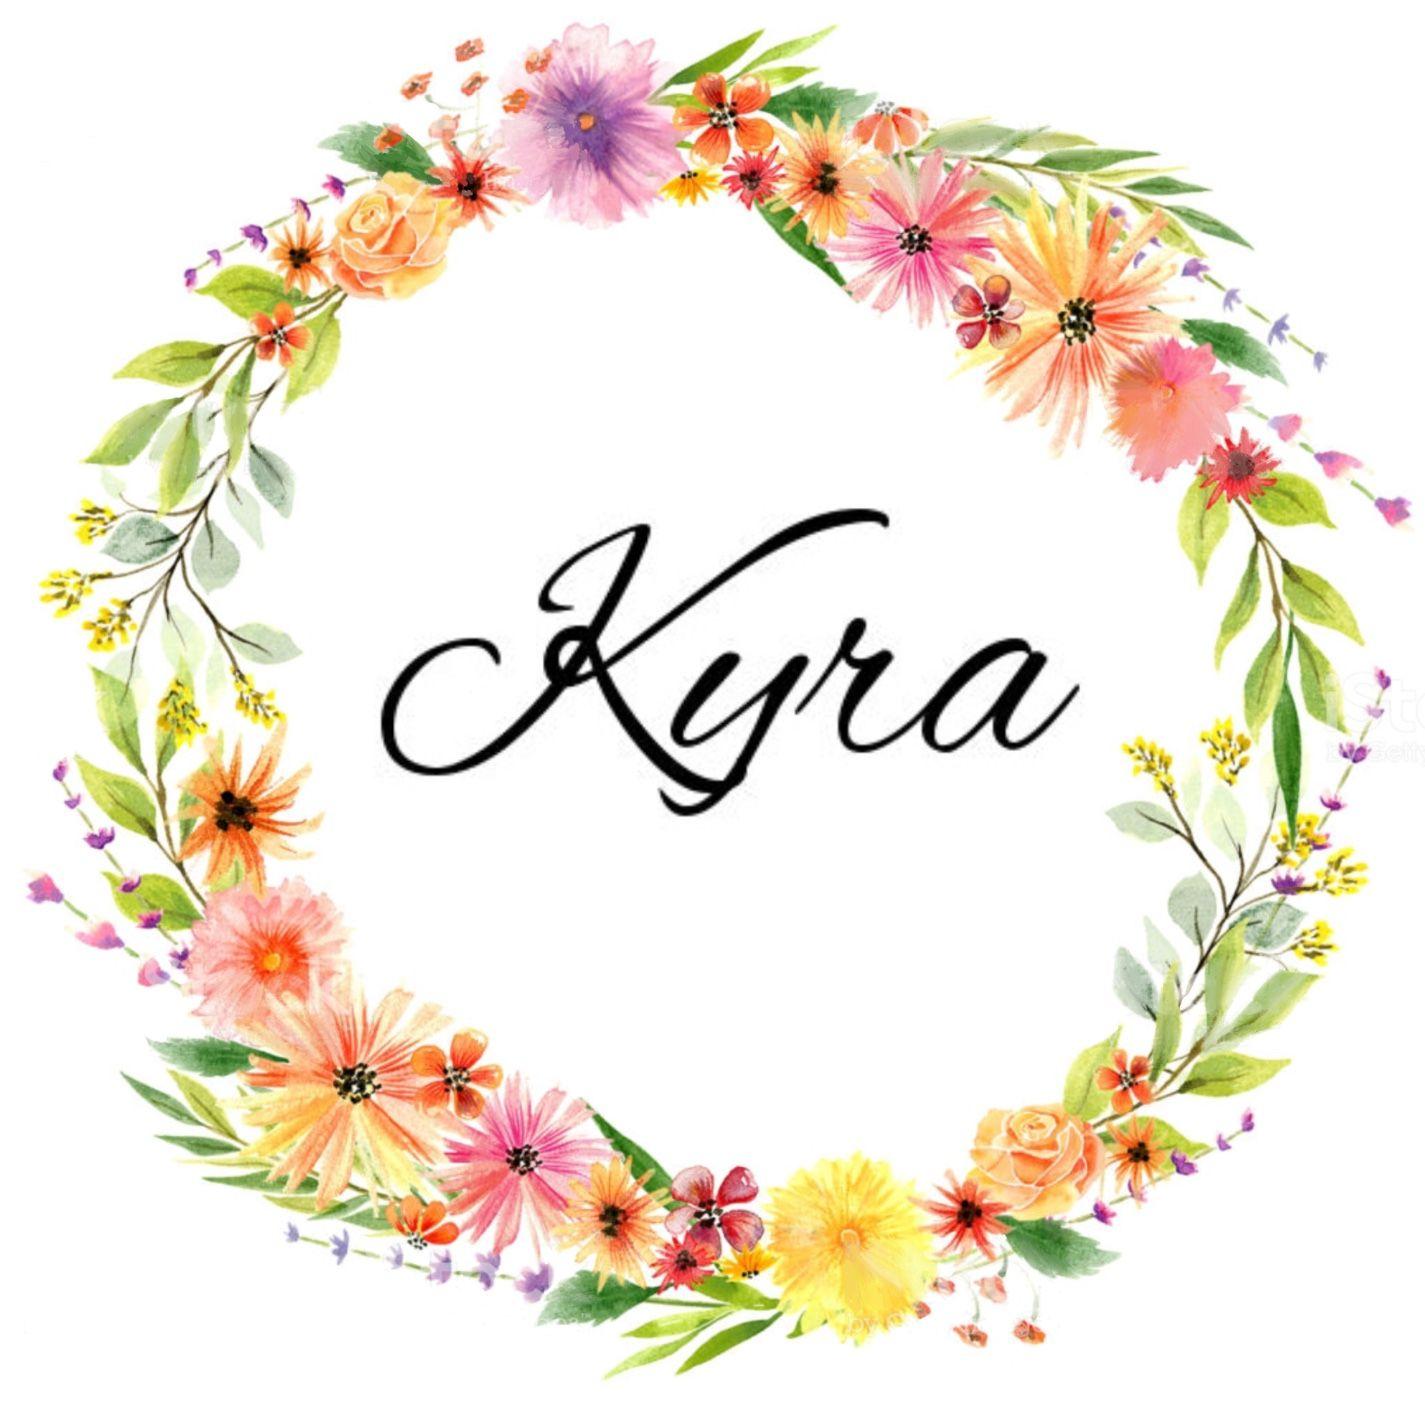 Girls Name In Floral Wreath Kyra Kyra Kie Rah Persian Greek Throne Enthroned Baby Girl Names Name Wallpaper Watercolor Inspiration